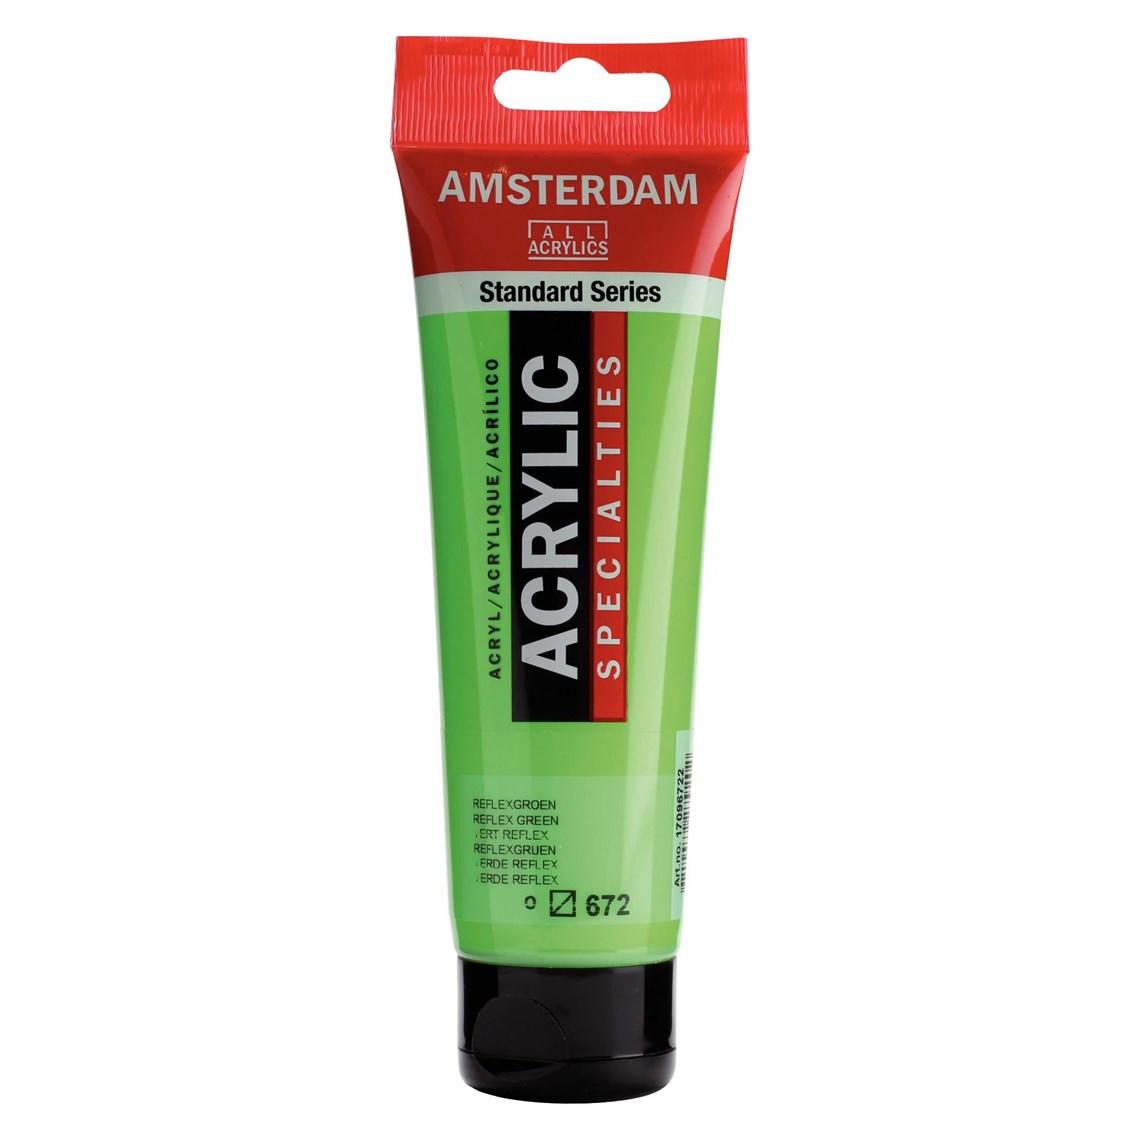 Amsterdam Acryl Reflexgroen 672 specialties